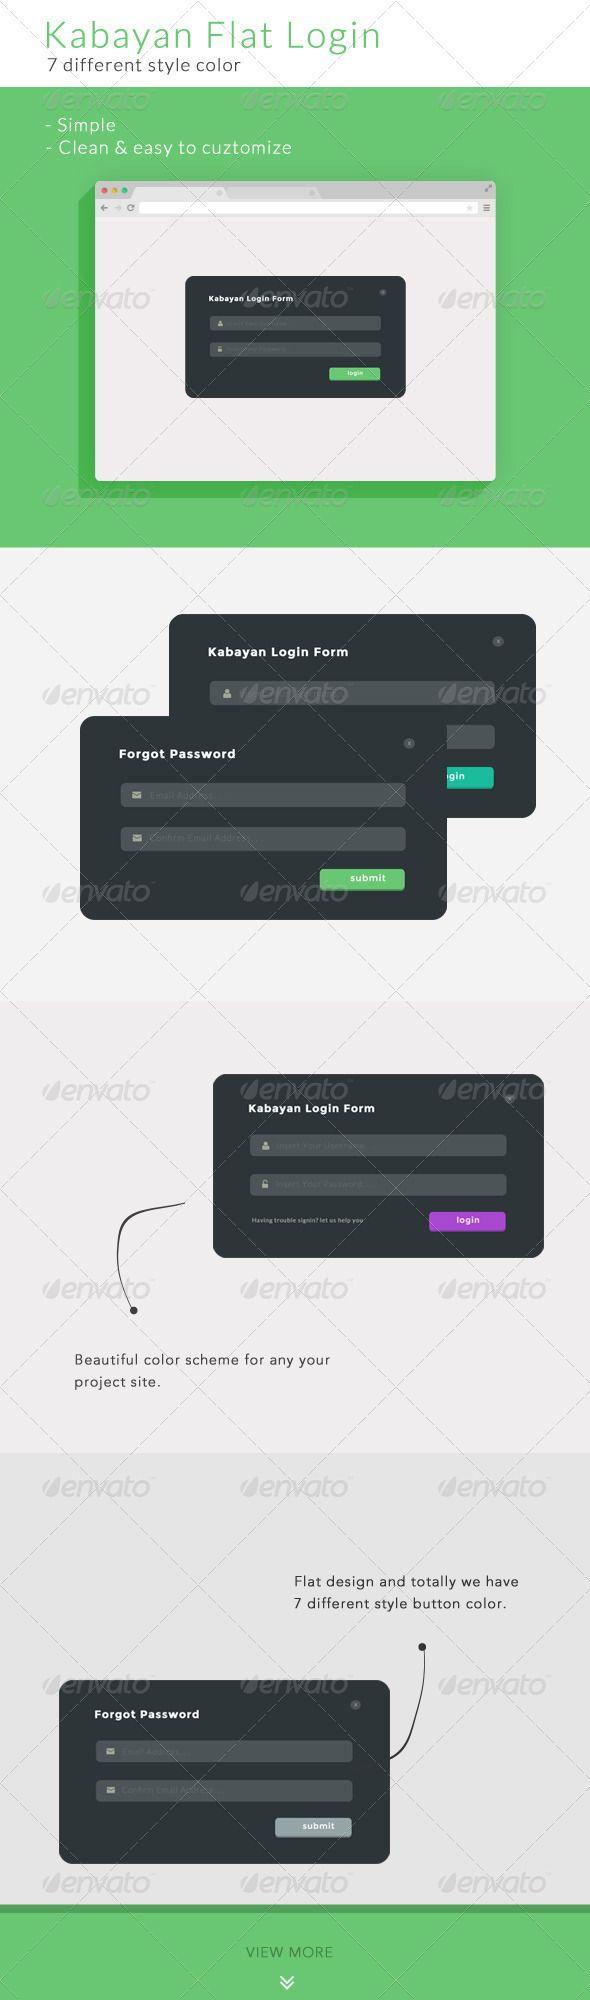 Kabayan Flat Login or Sign | Grid layouts, Google fonts and Template